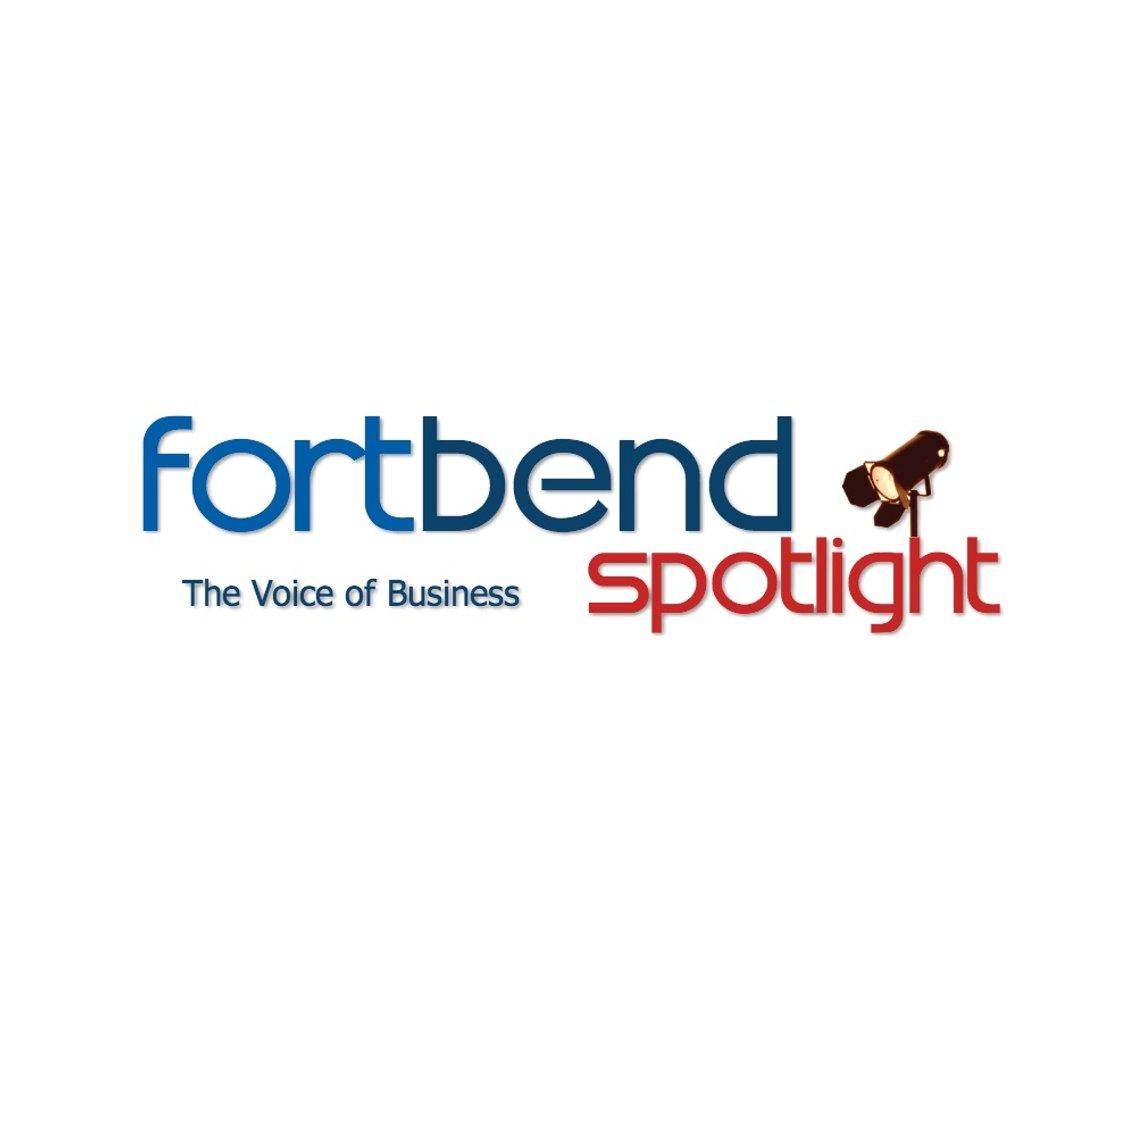 Fort Bend Spotlight - imagen de portada